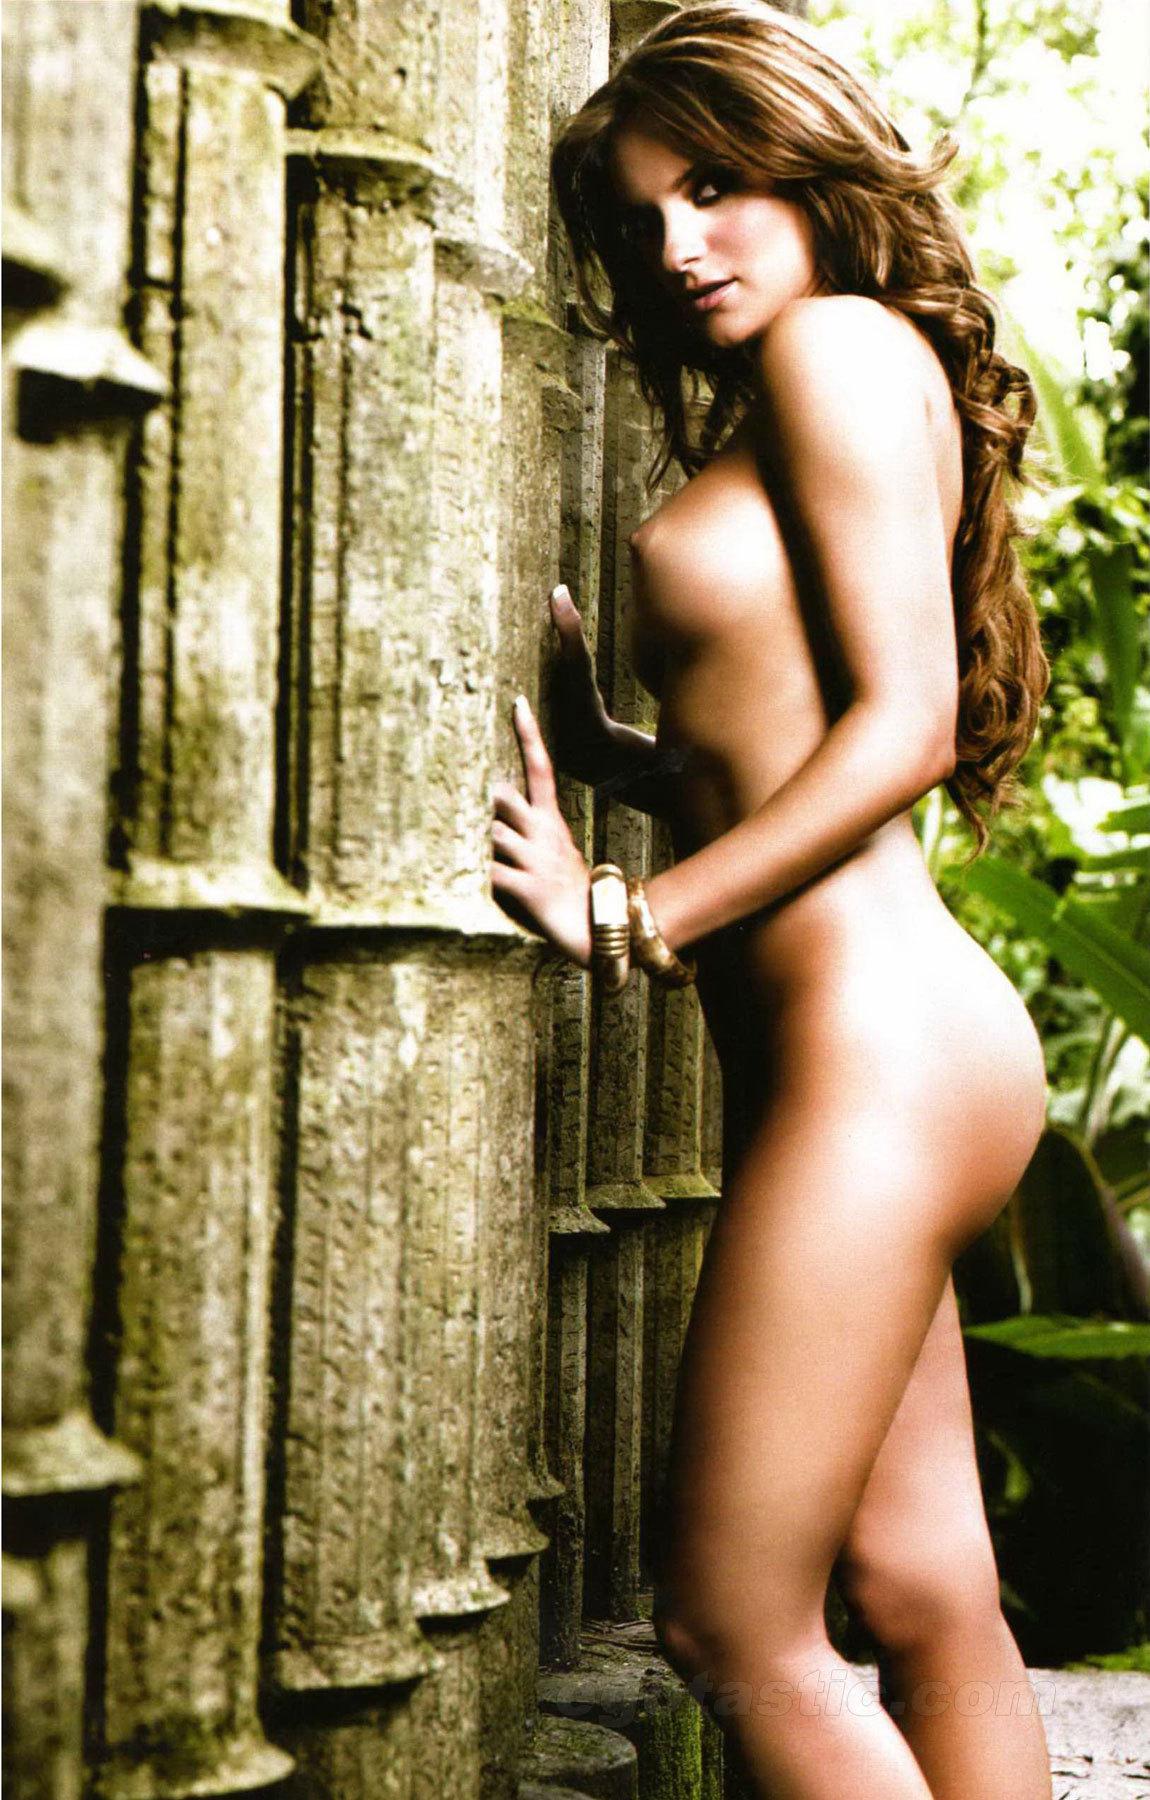 mariana seoane totally naked